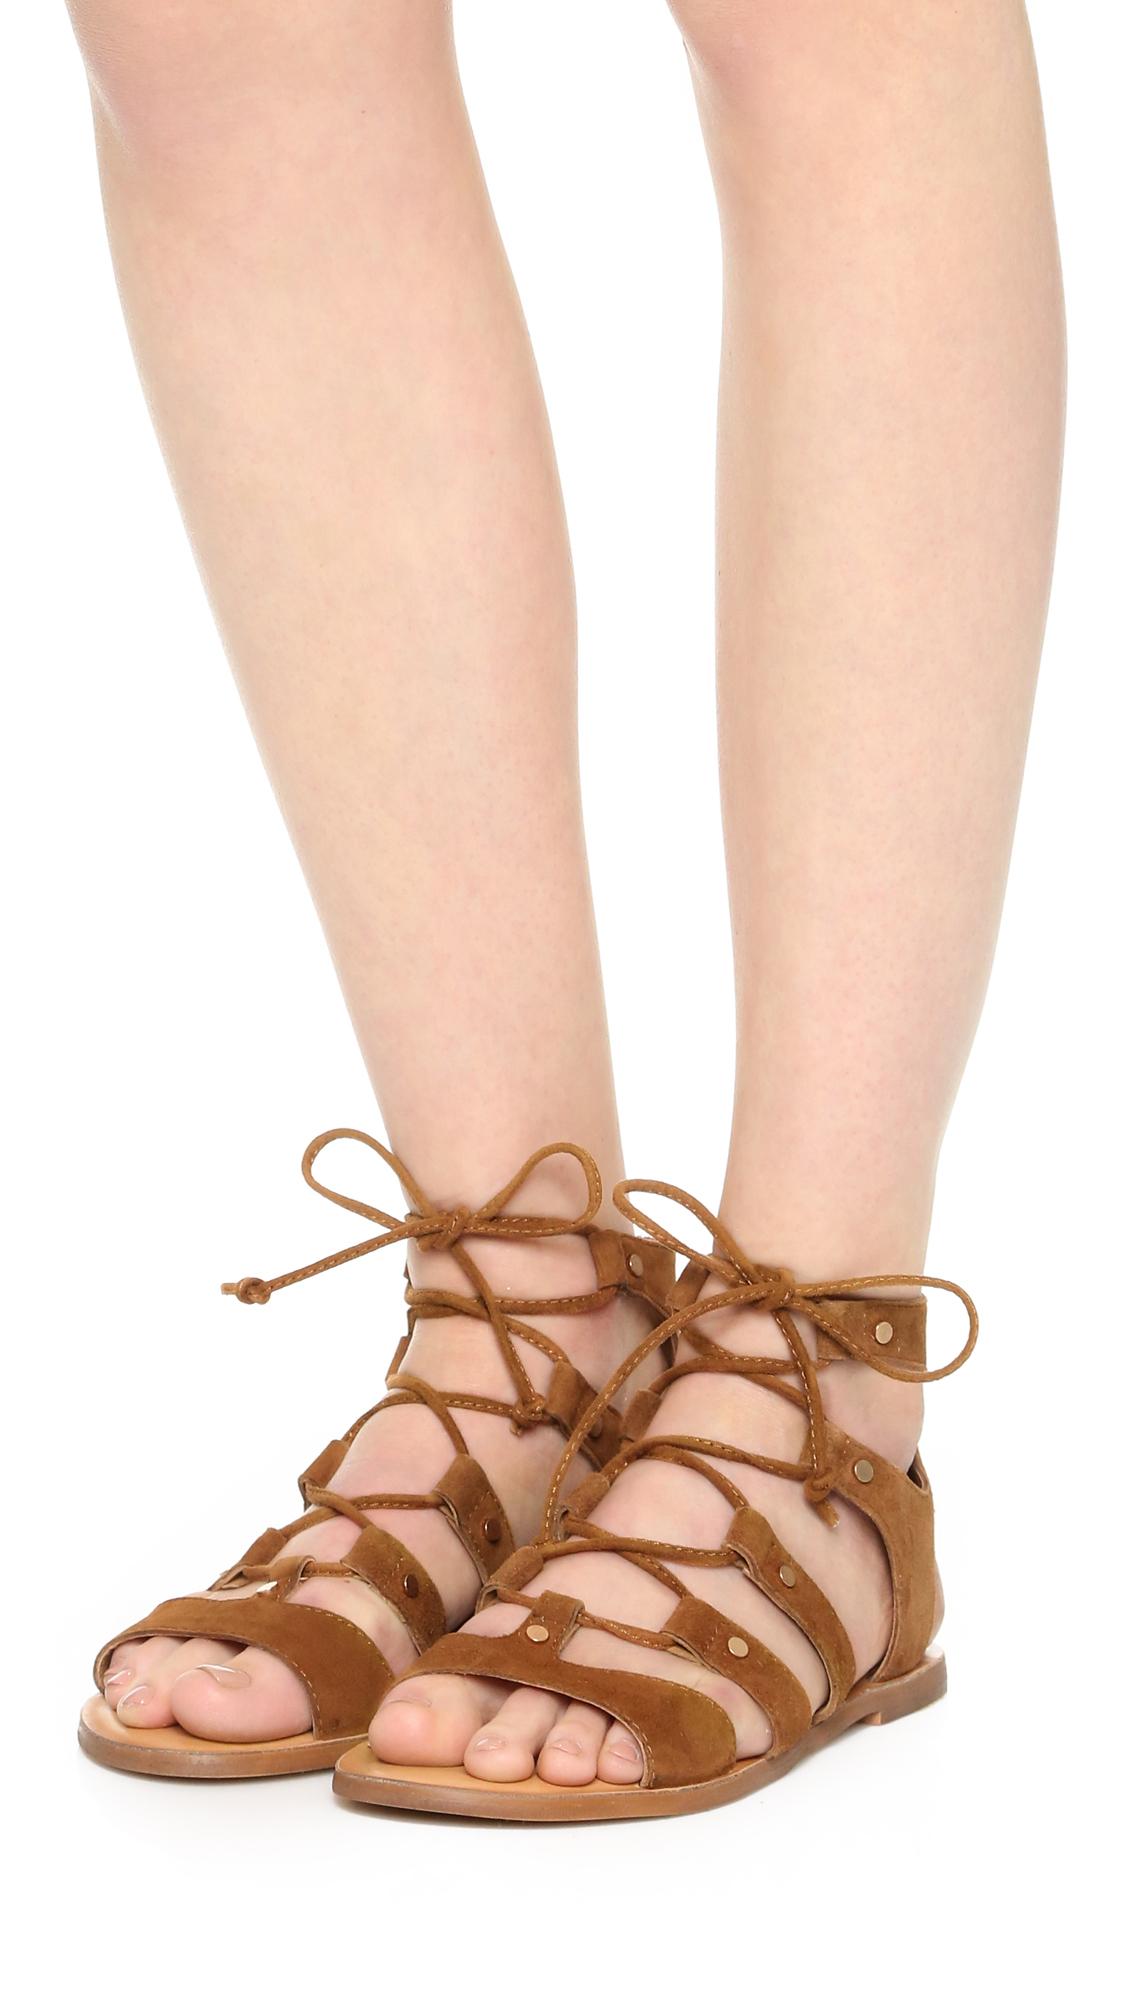 633ce6d1f4f Lyst - Dolce Vita Jasmyn Suede Gladiator Sandals in Brown